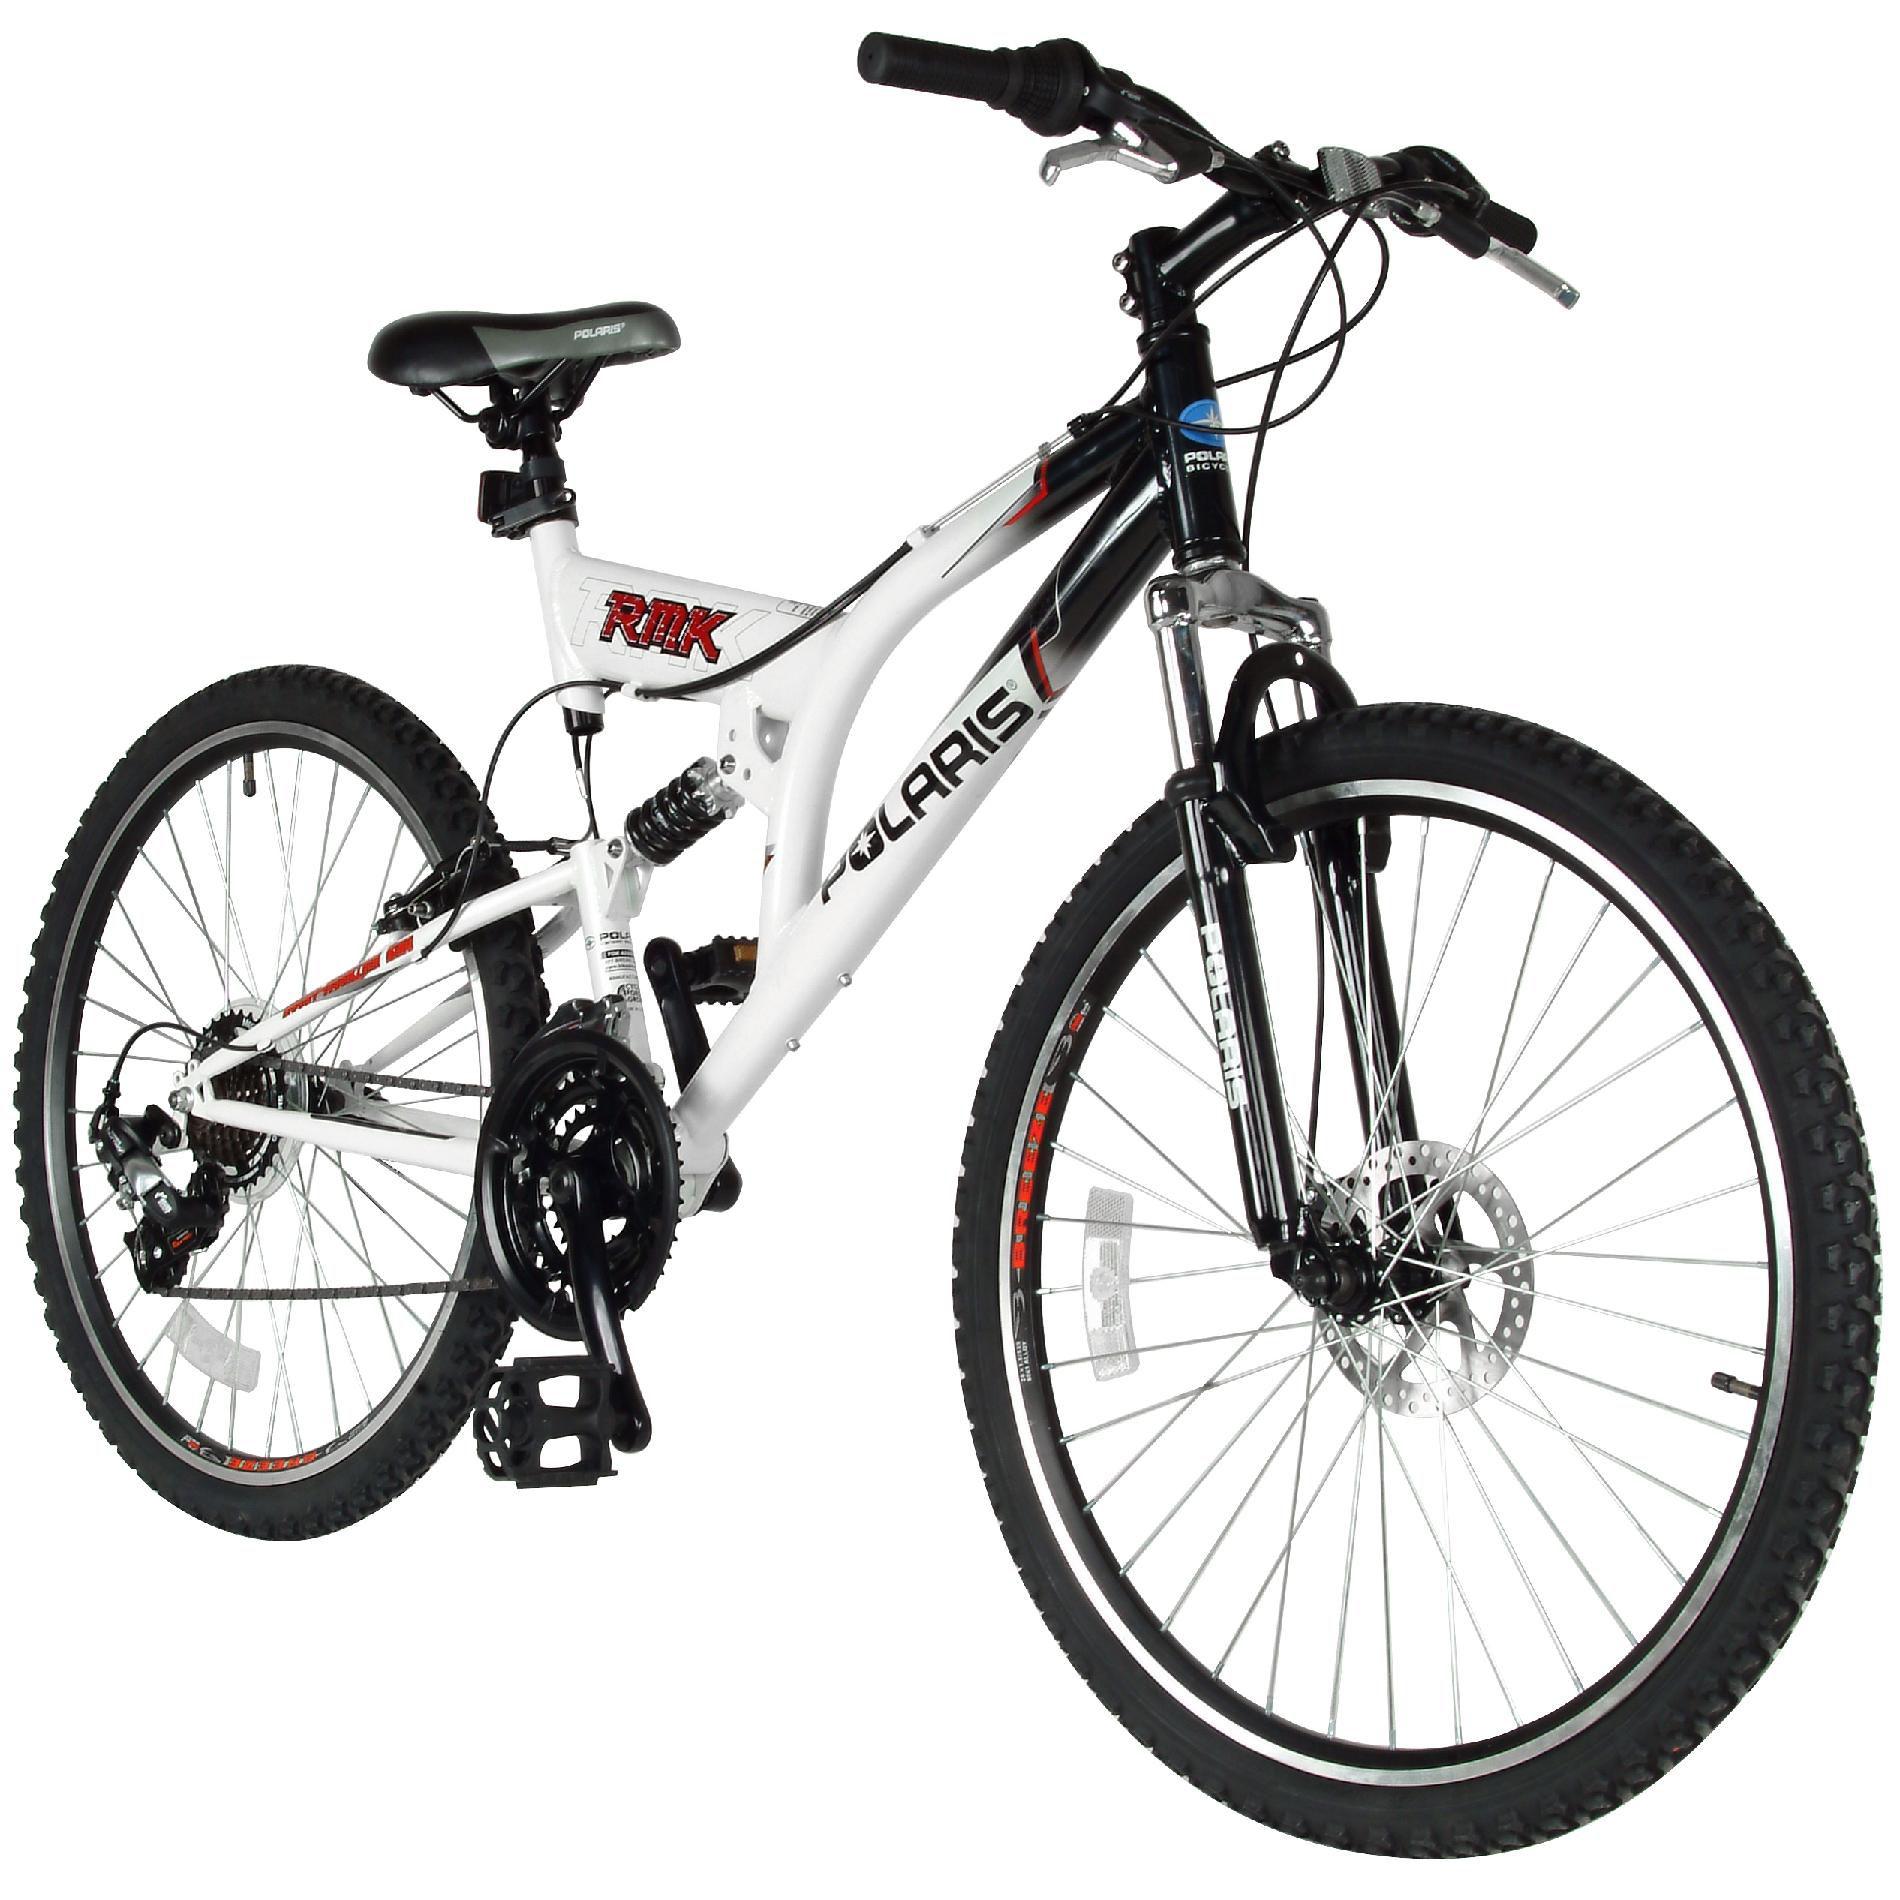 "Polaris RMK 26"" Dual Suspension Mens Mountain Bike"